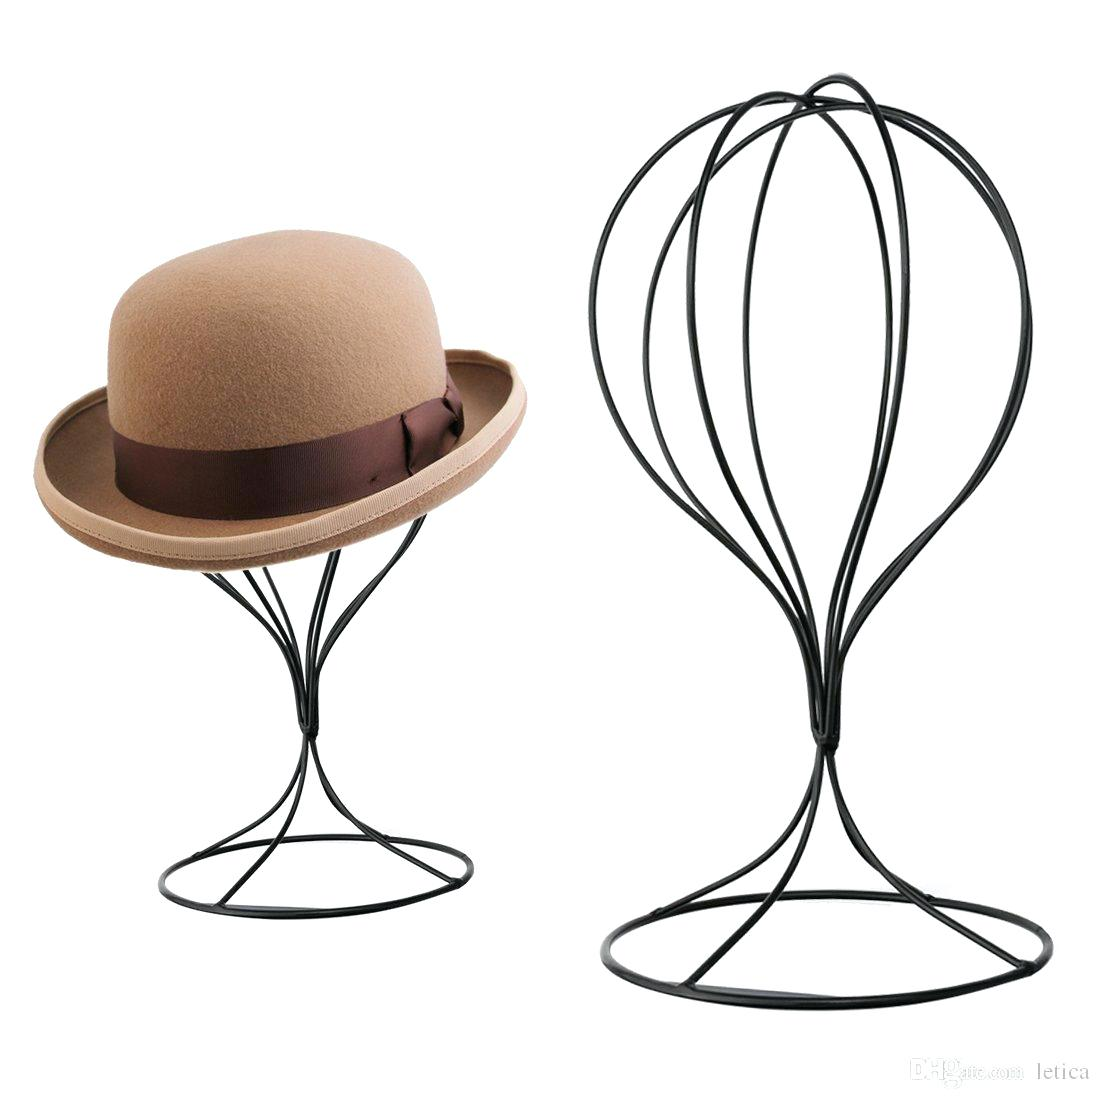 1100x1100 Hat Holder For Closet Rack Amazon Uk Amazonca